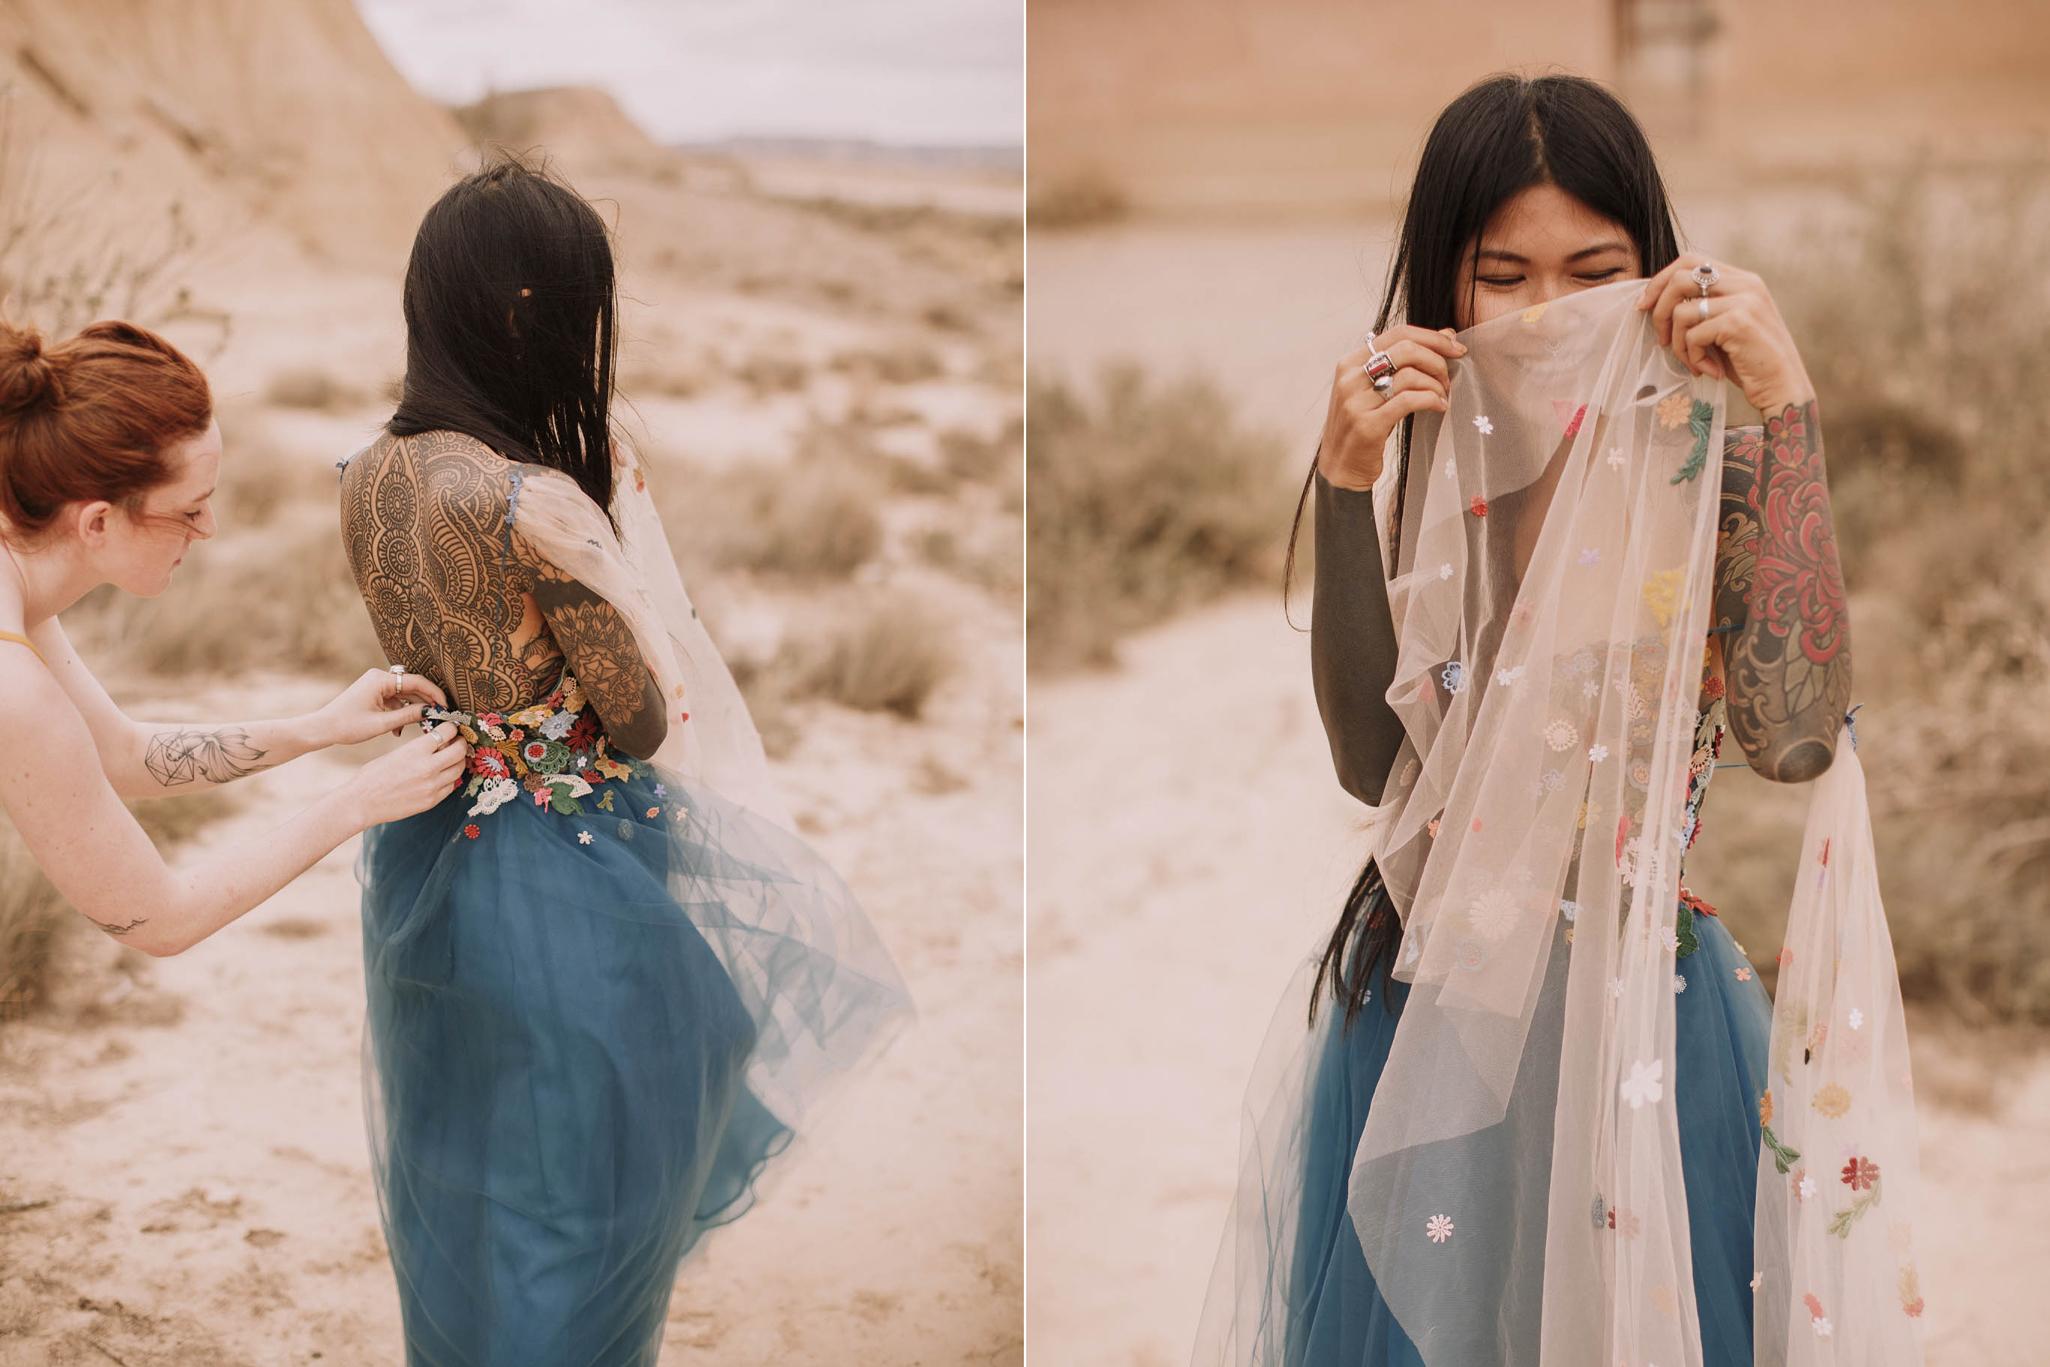 Spain-wedding-photographer-bardenas-reales-jeremy-boyer-photographe-mariage-bordeaux-floral-wedding-dress-robe-65.jpg